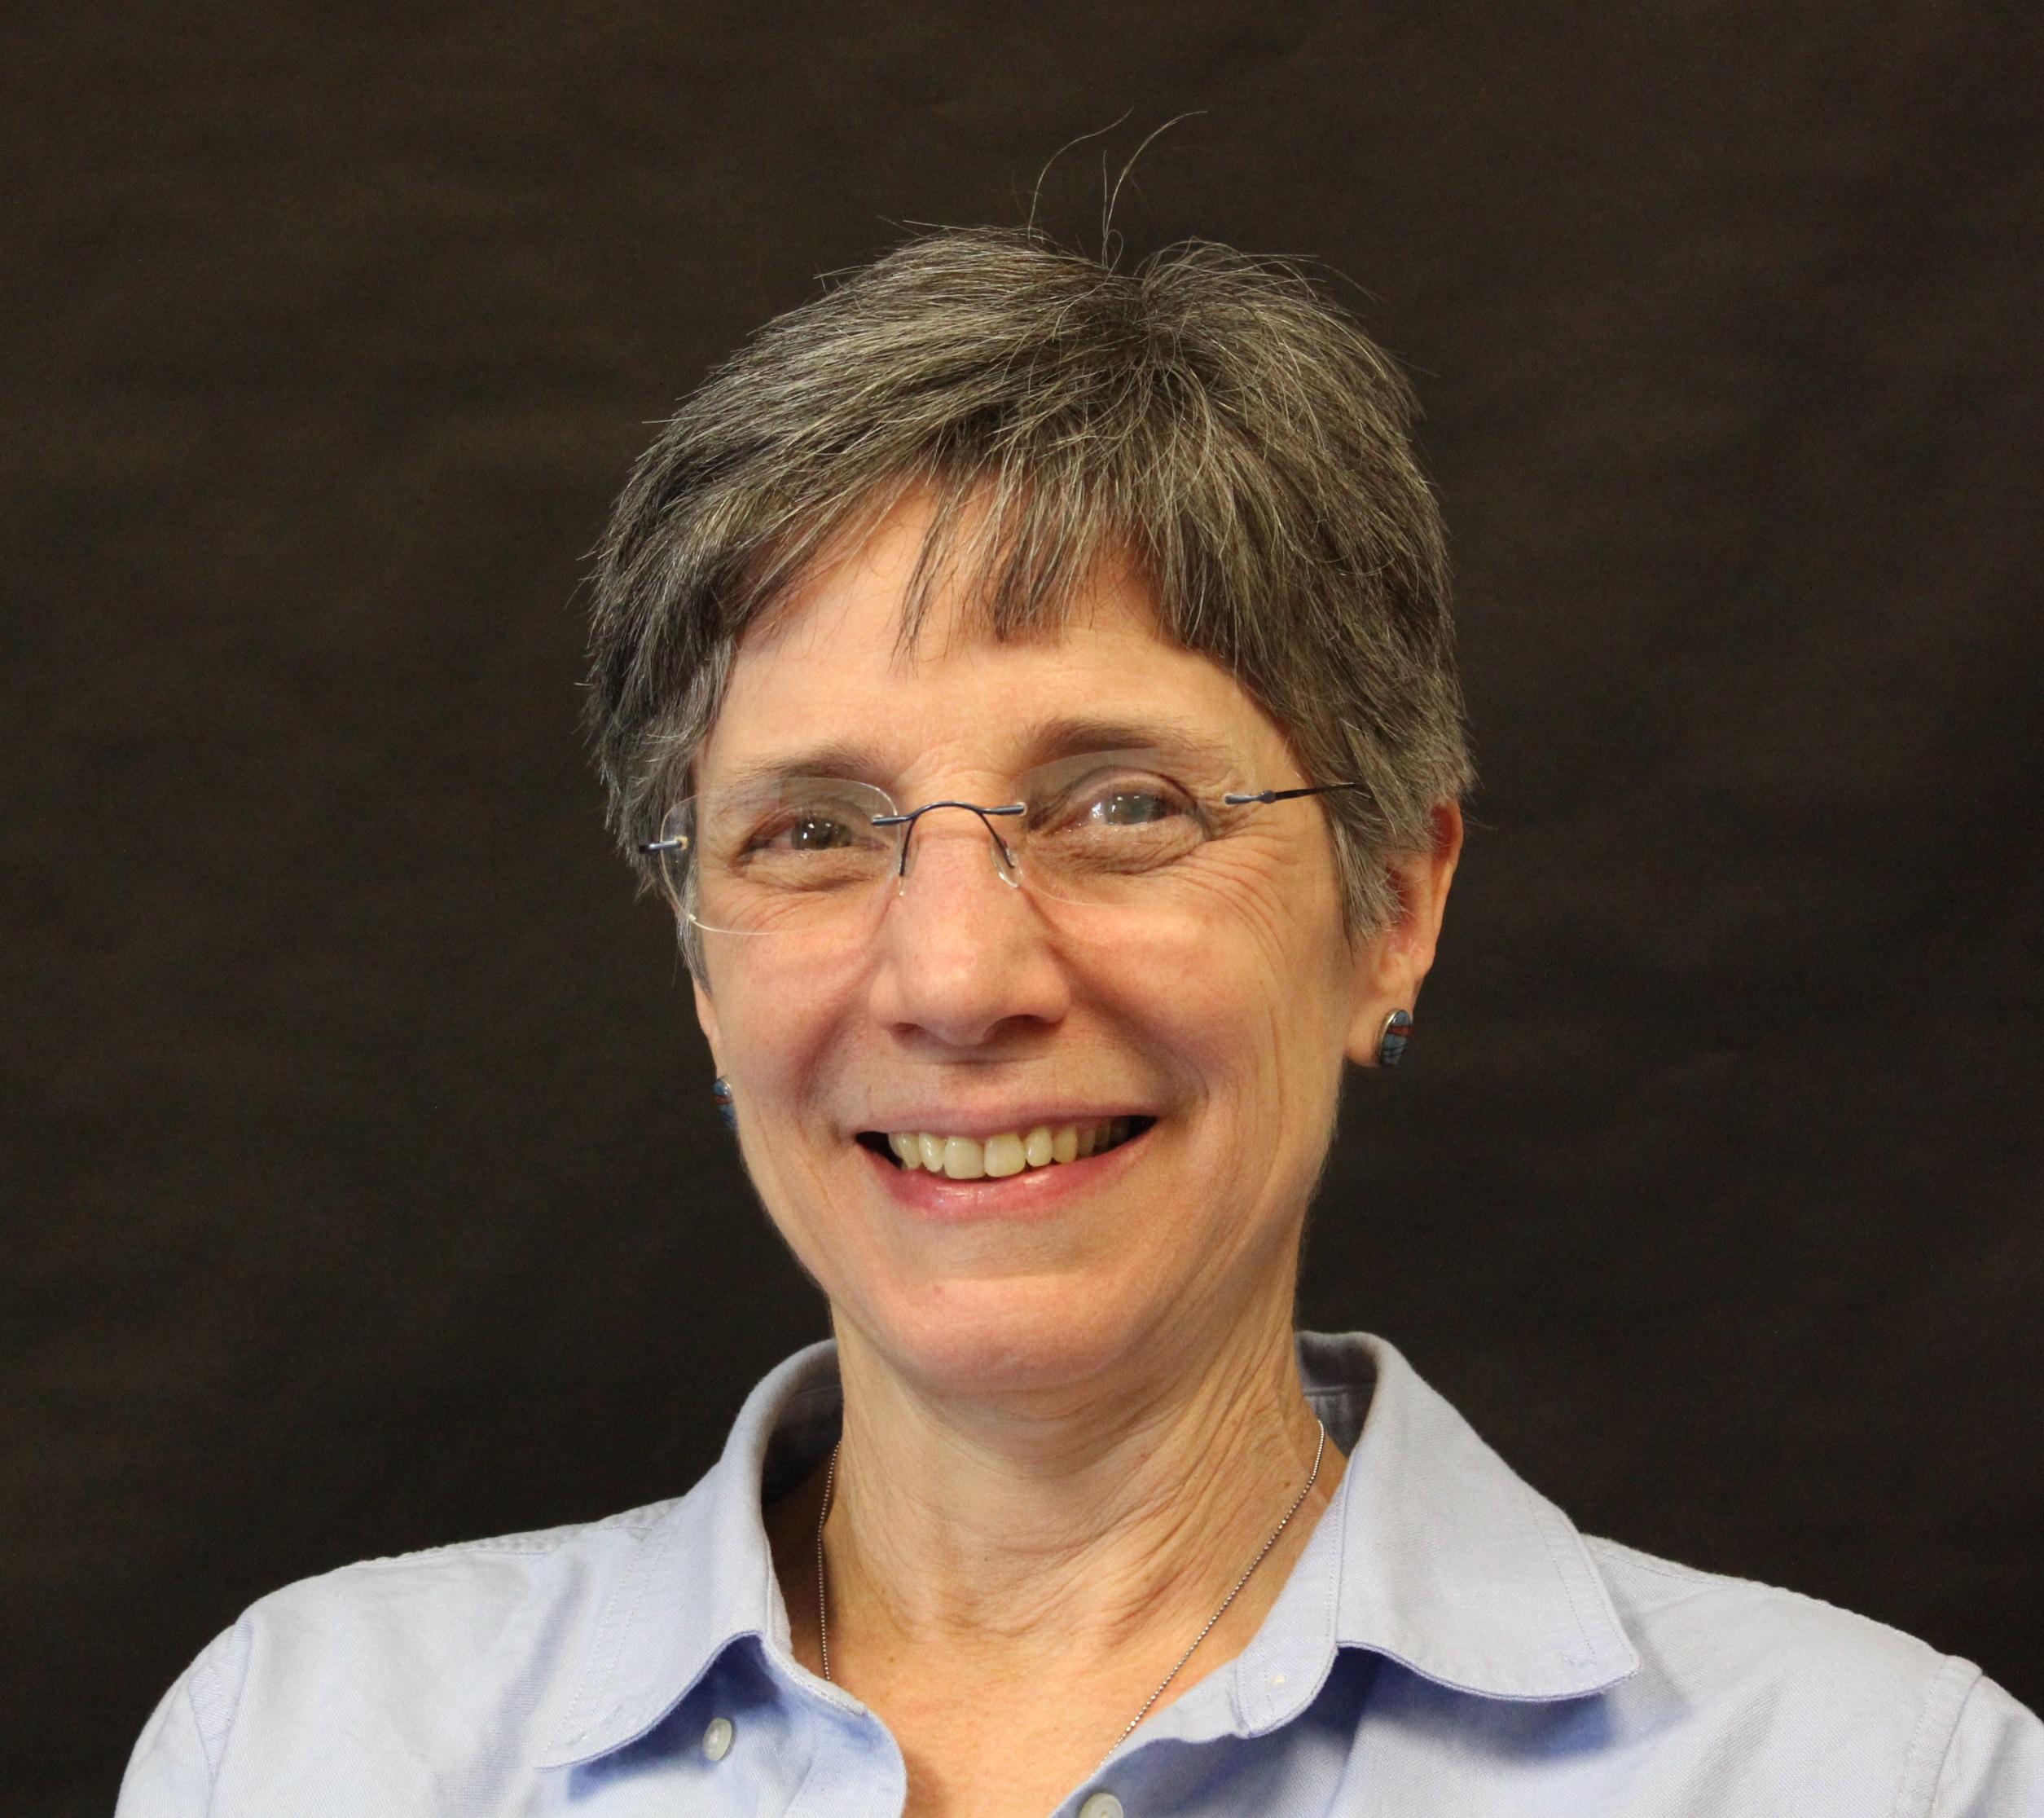 Denise Gottfredson